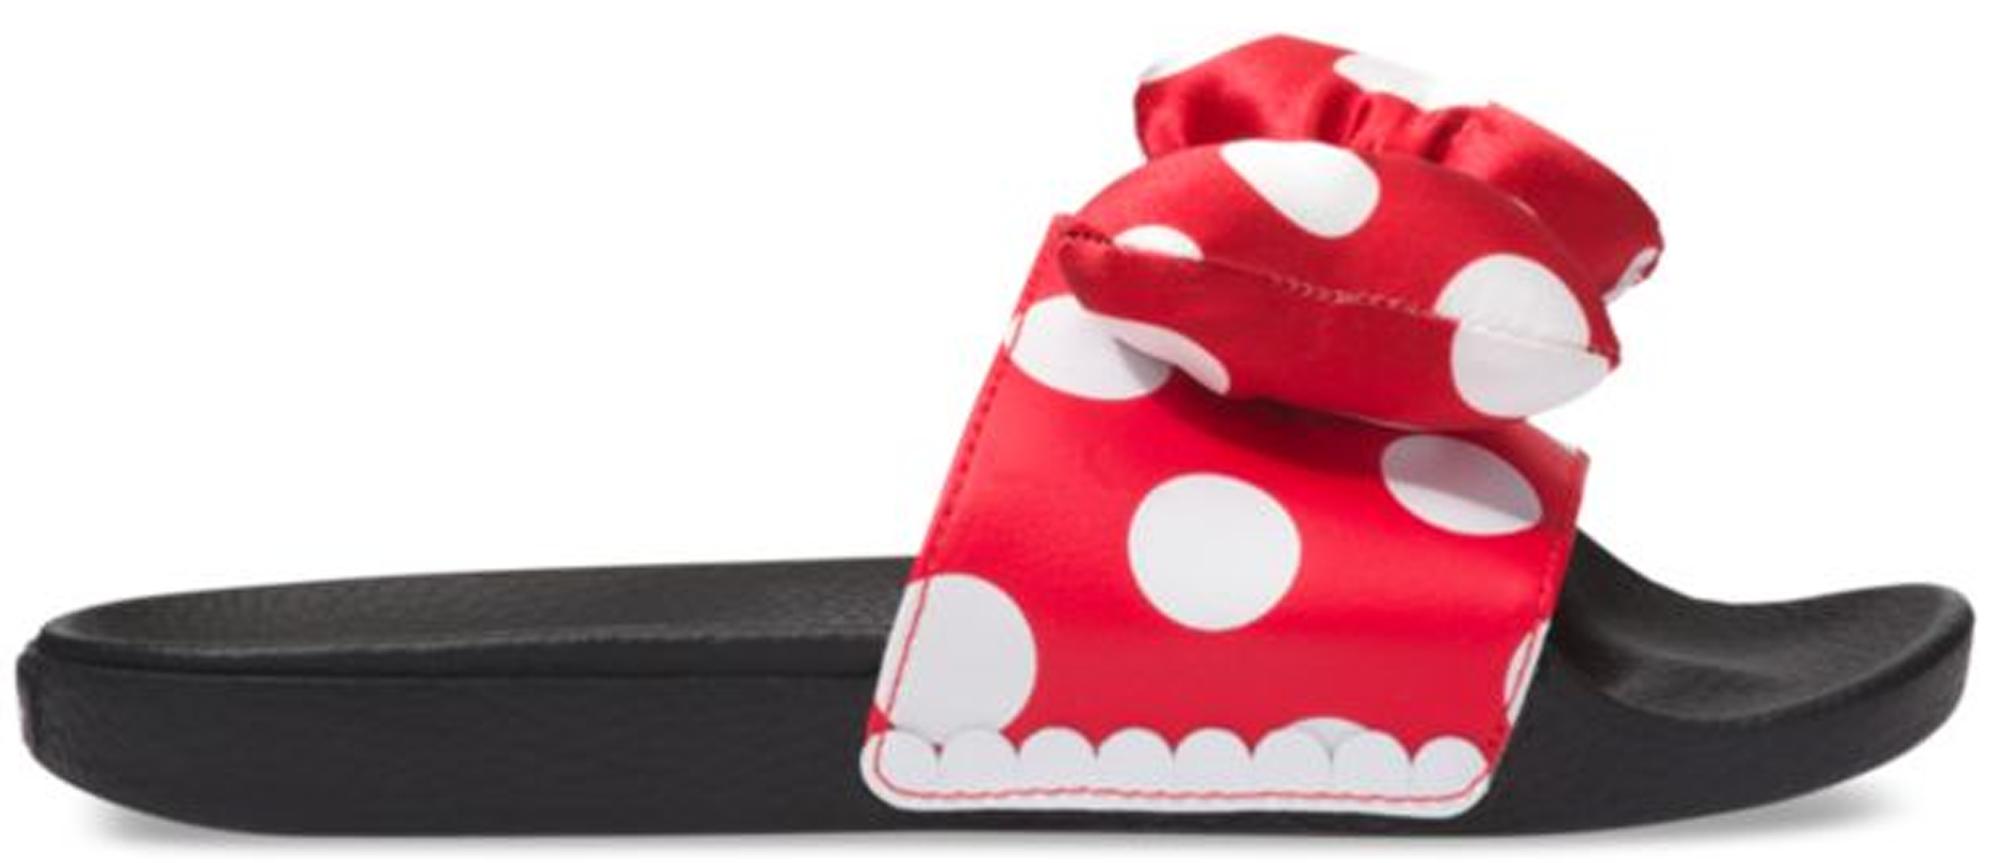 Vans Slide-On Disney Minnie Mouse Bow